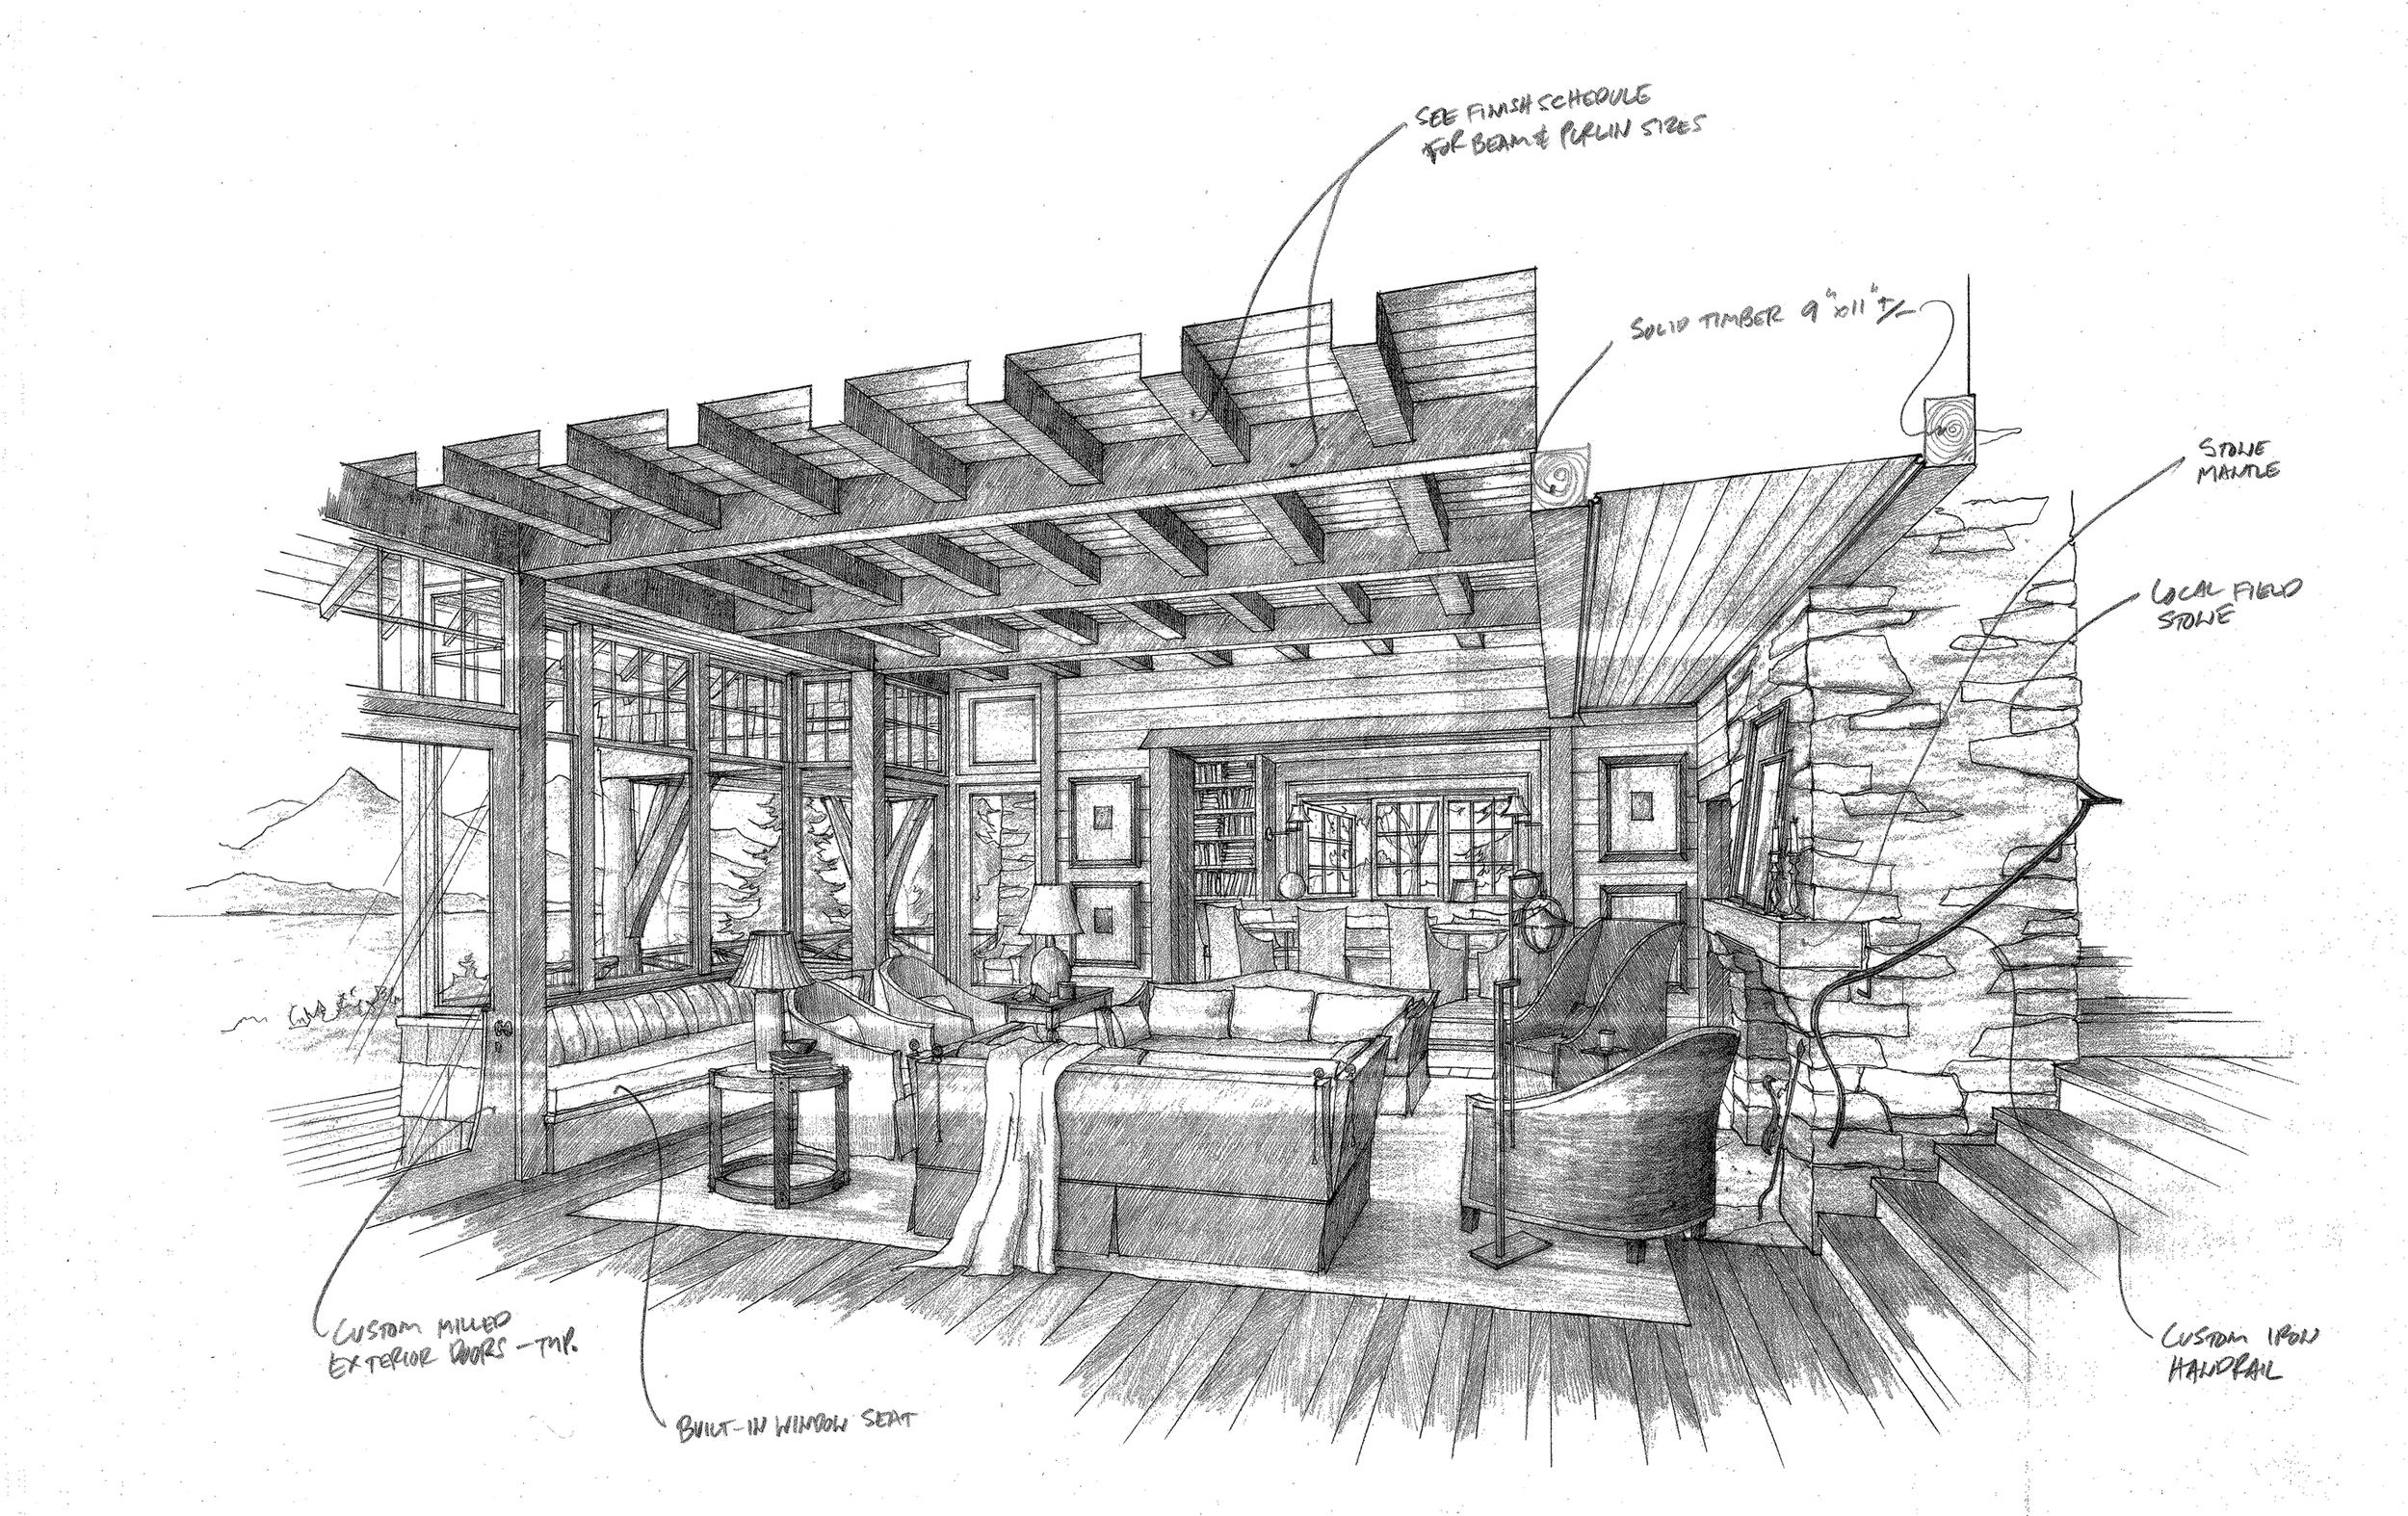 Lake_Placid.New_York.Lake_House.Robert_Orr_&_Associates.Architecture.Landscape_Architecture.Urbanism.Camp.Great_Room_Perspective.Mark_Kline_Del.Pursley_Dixon.jpg